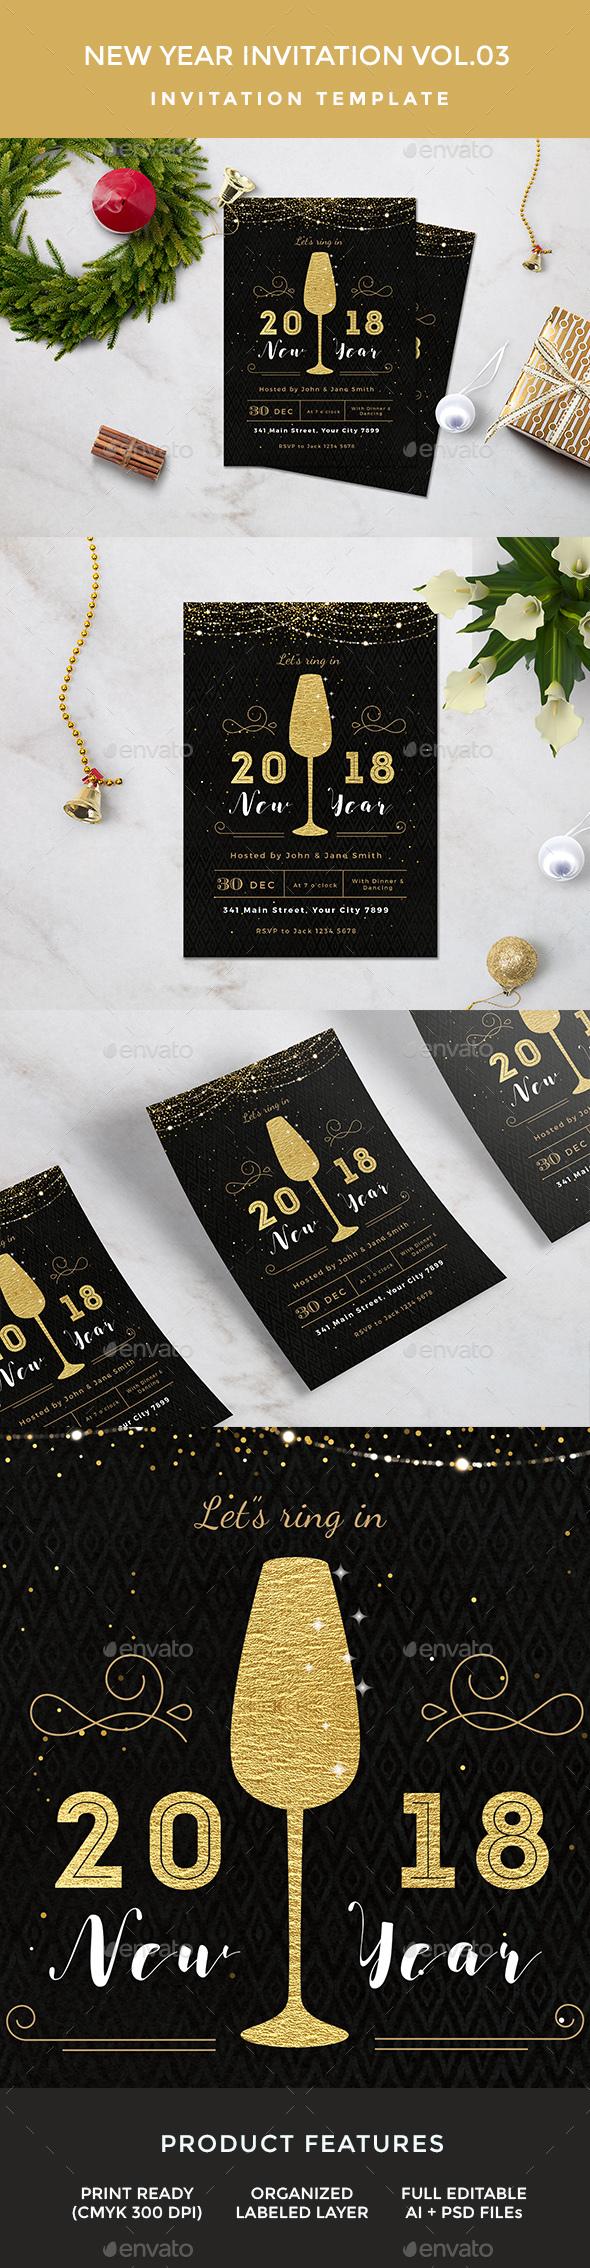 New Year Invitation - Invitations Cards & Invites